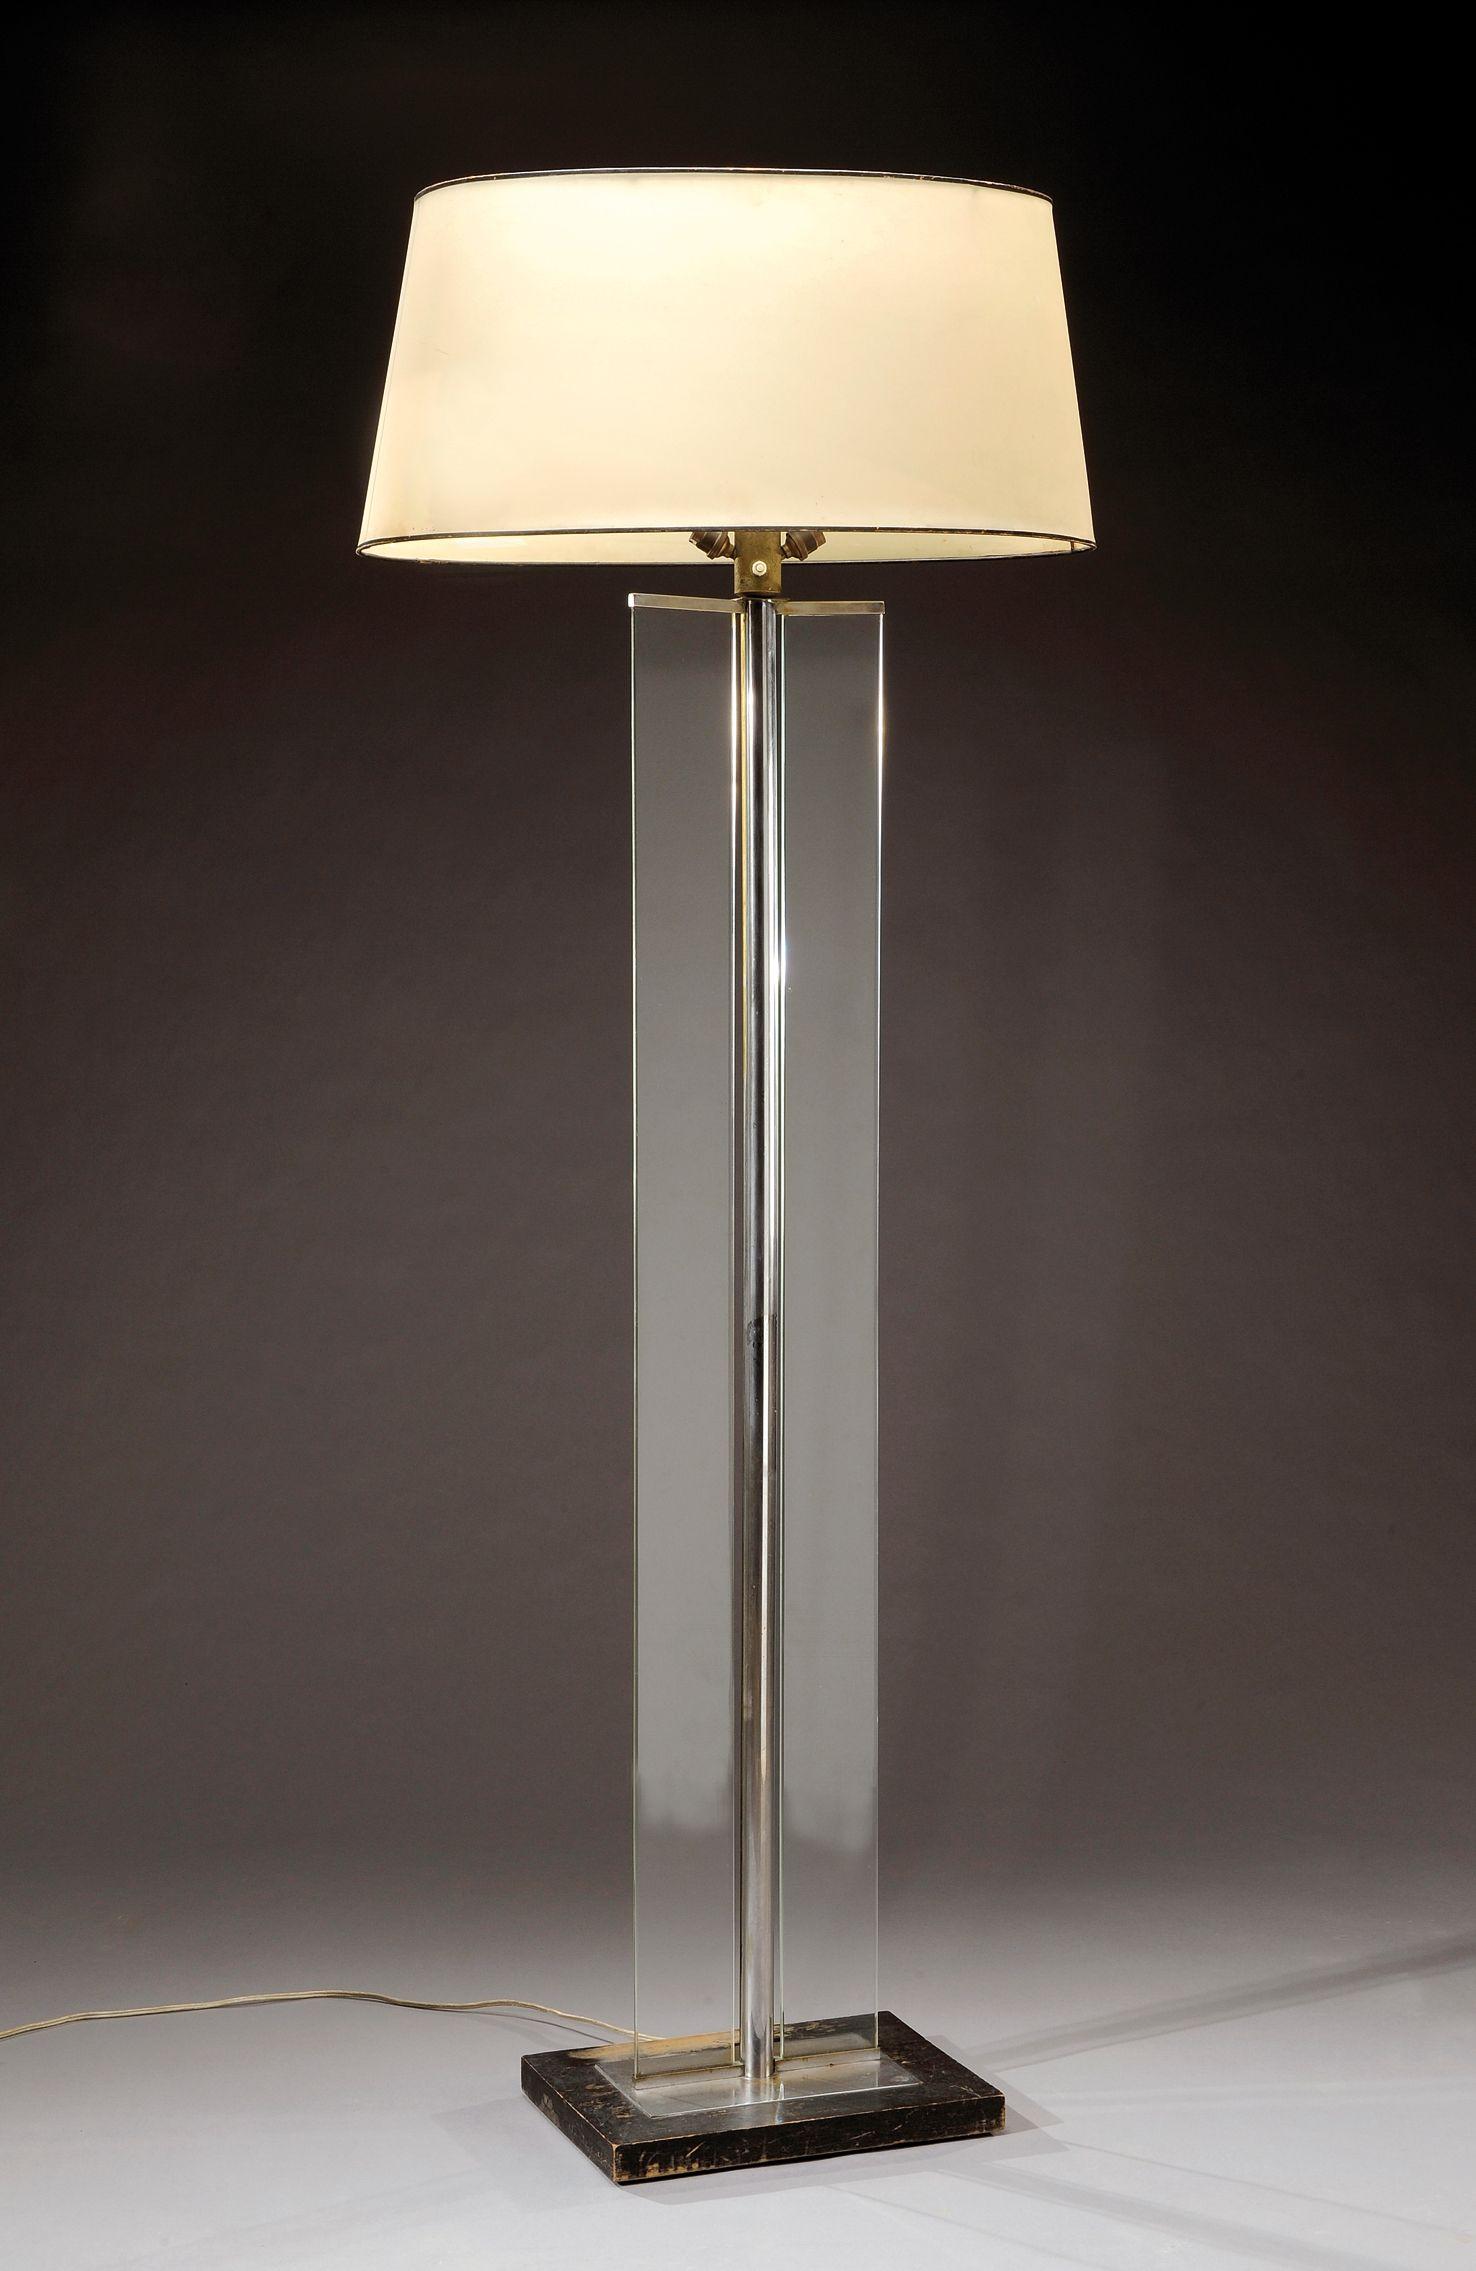 Murano gl floor lamp murano gl floor lamps 173 for at 1stdibs - Jacques Adnet 1901 1984 Lampadaire Moderniste F T Cylindrique En M Tal Nickel Enserrant